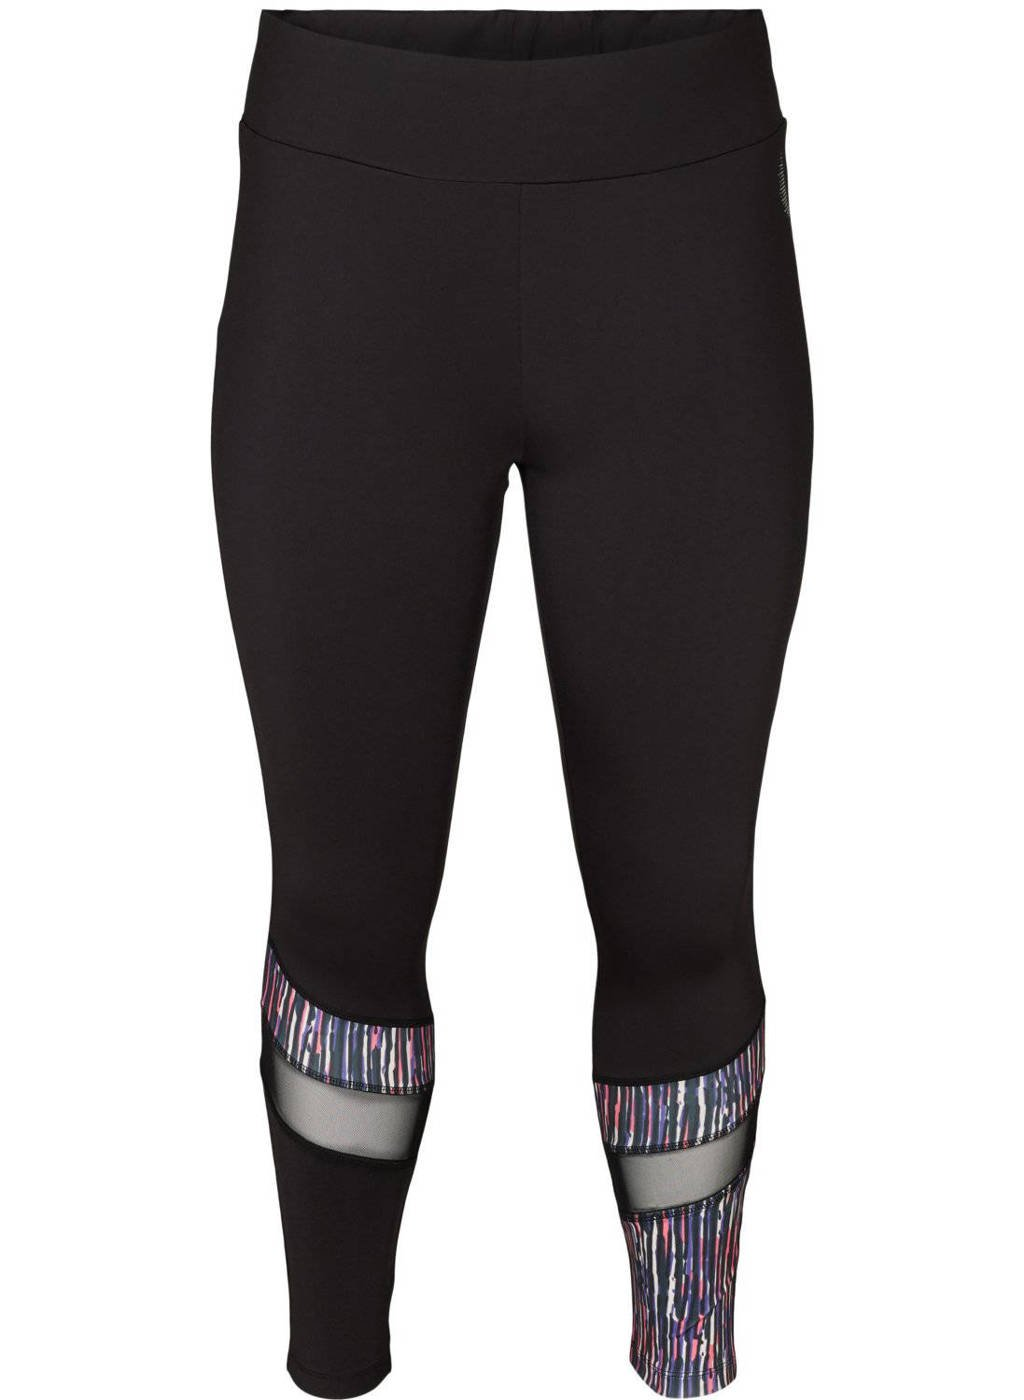 ACTIVE By Zizzi Plus Size sportlegging zwart, Zwart